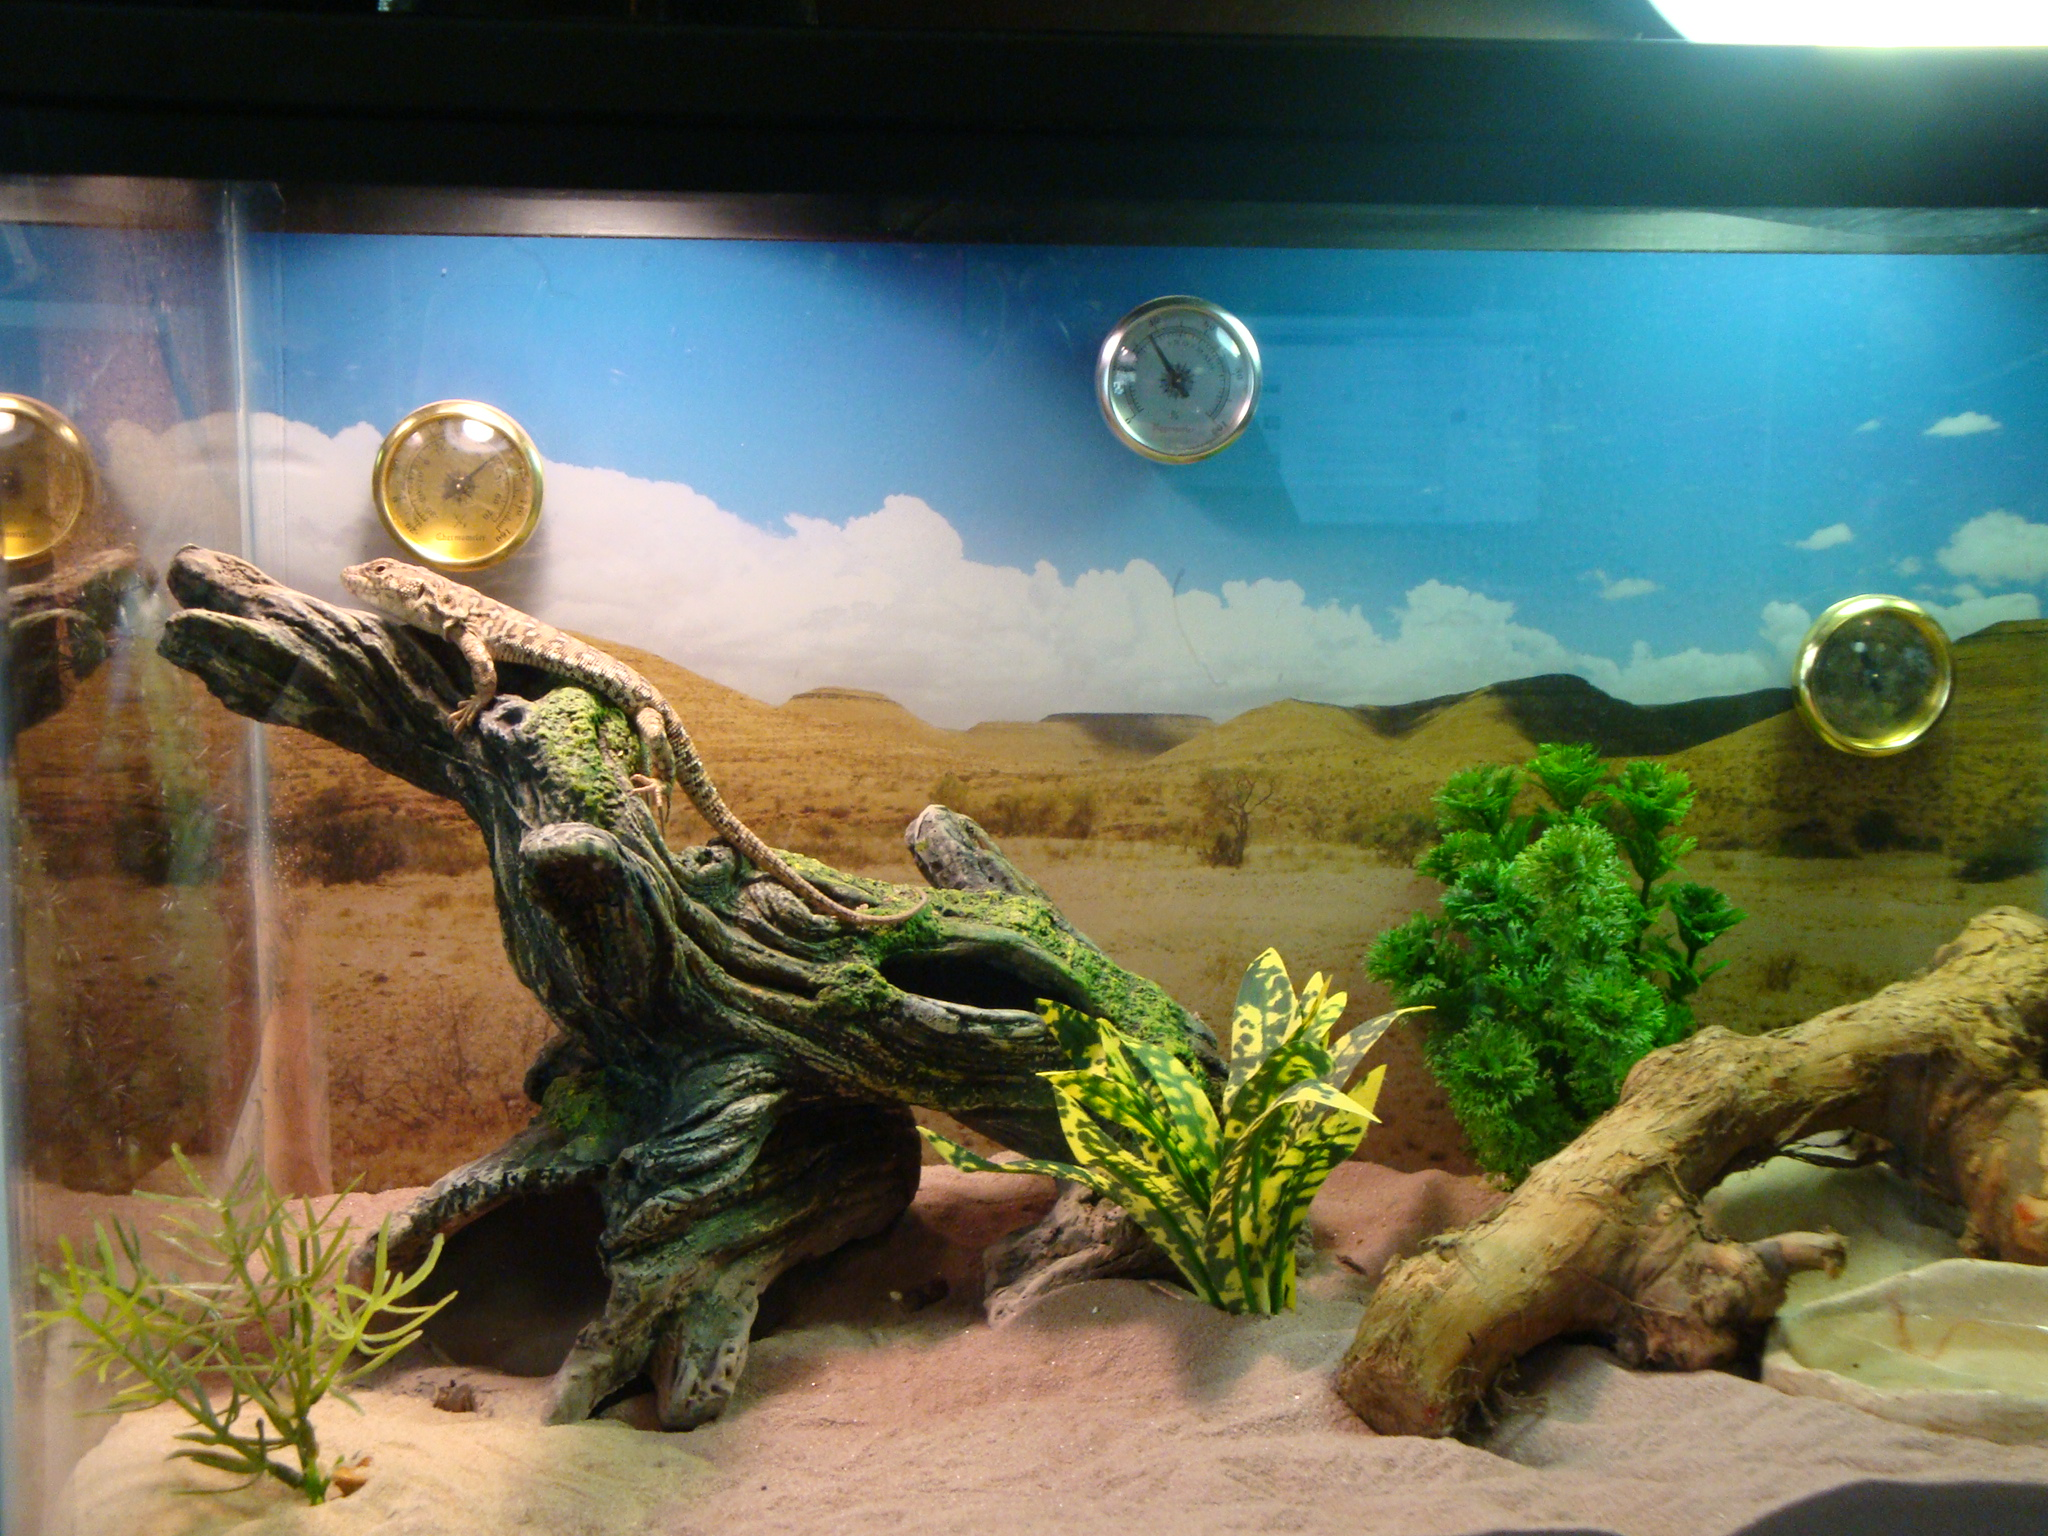 Beginner Reptiles The Steppe Runner Lizard Petiles Blog